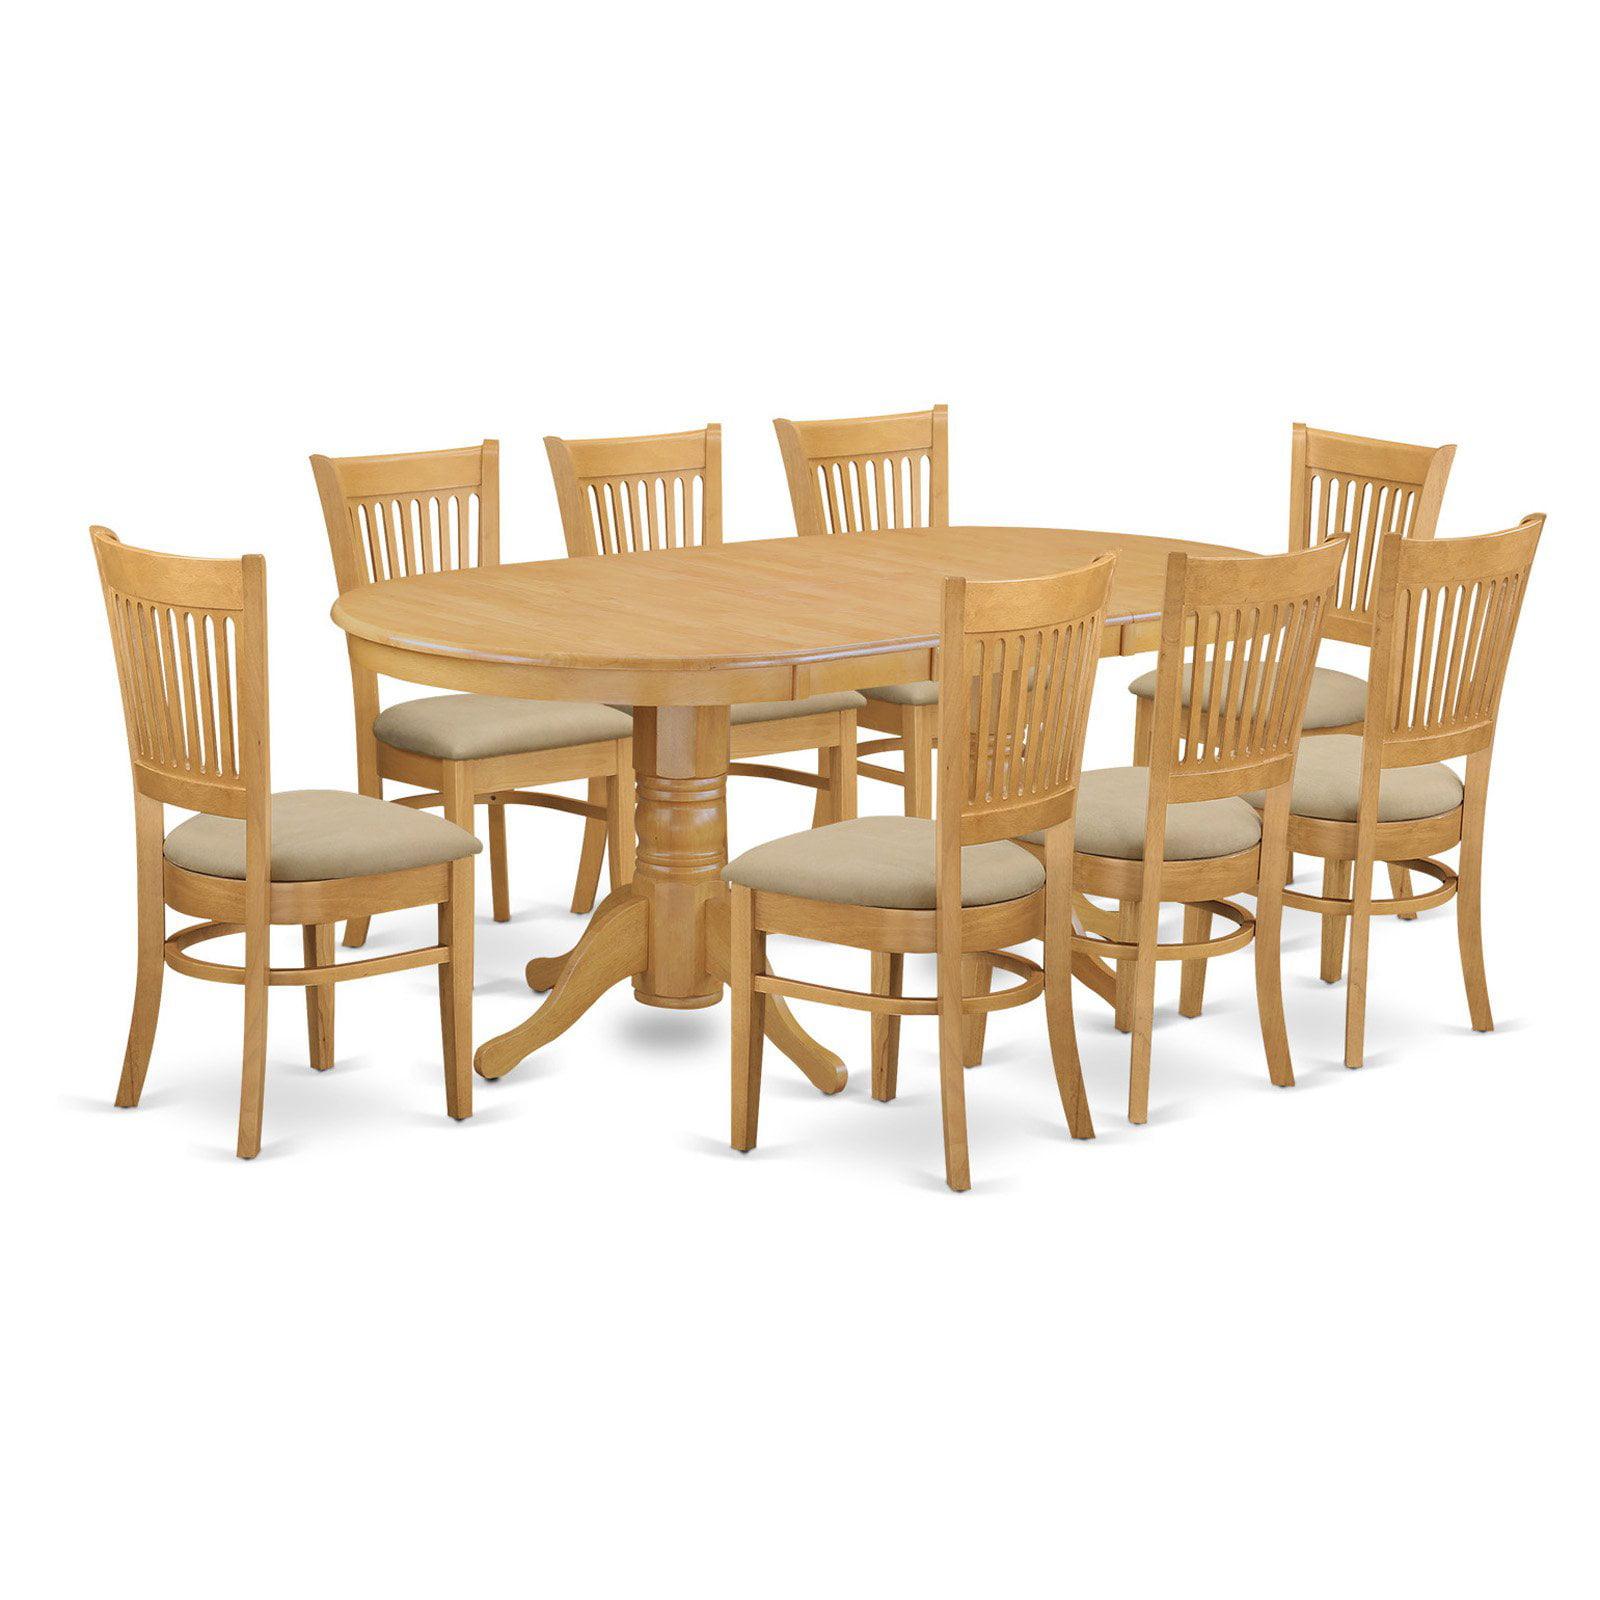 East west furniture vancouver 9 piece hepplewhite modern dining table set walmart com